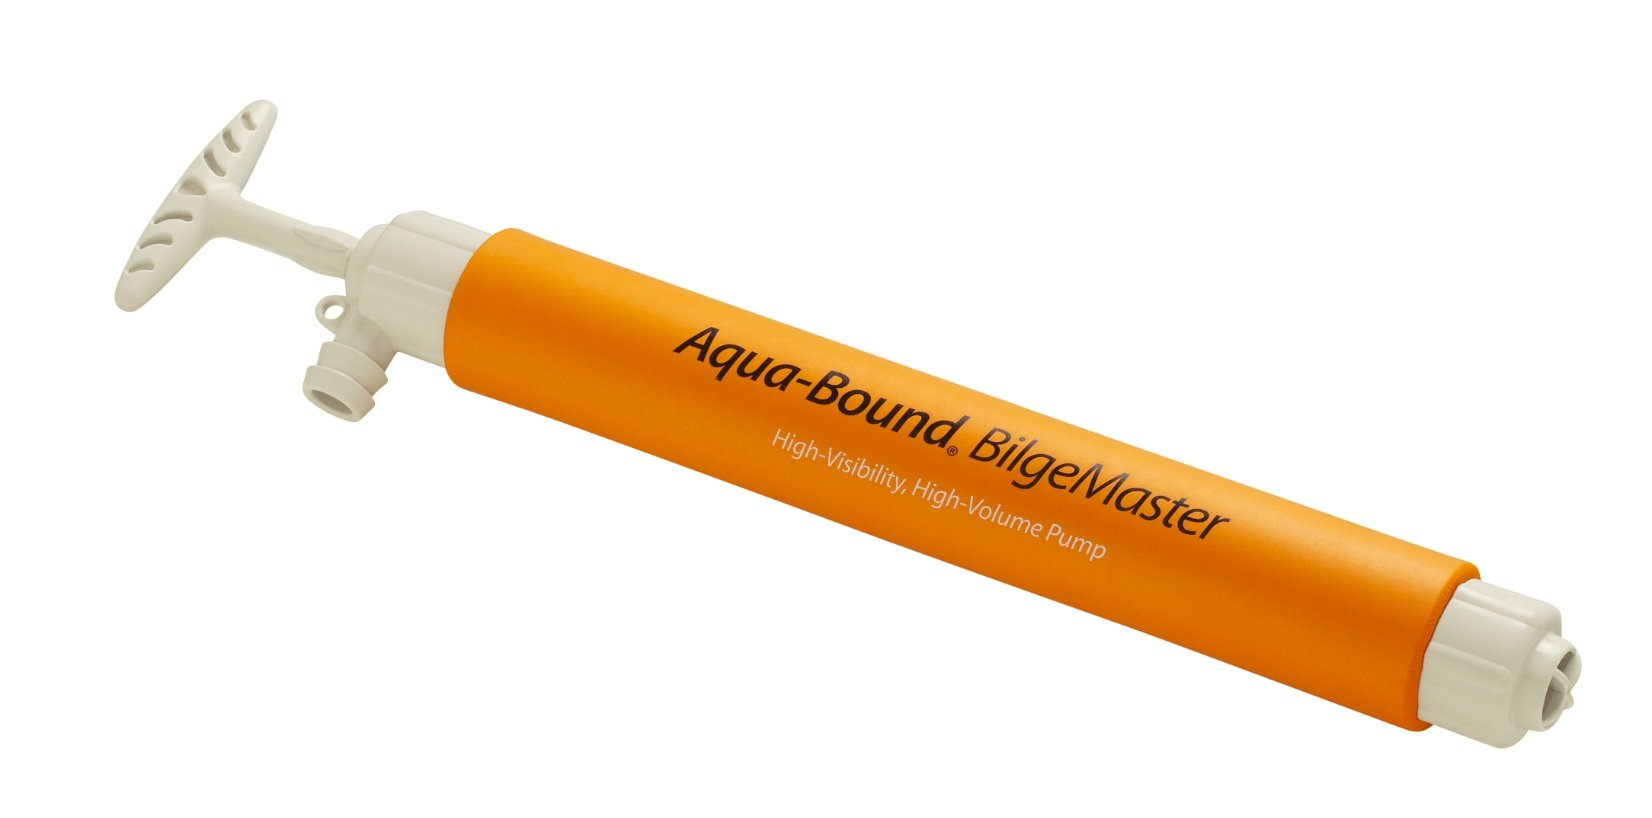 Aqua-Bound Kayak BilgeMaster Pump